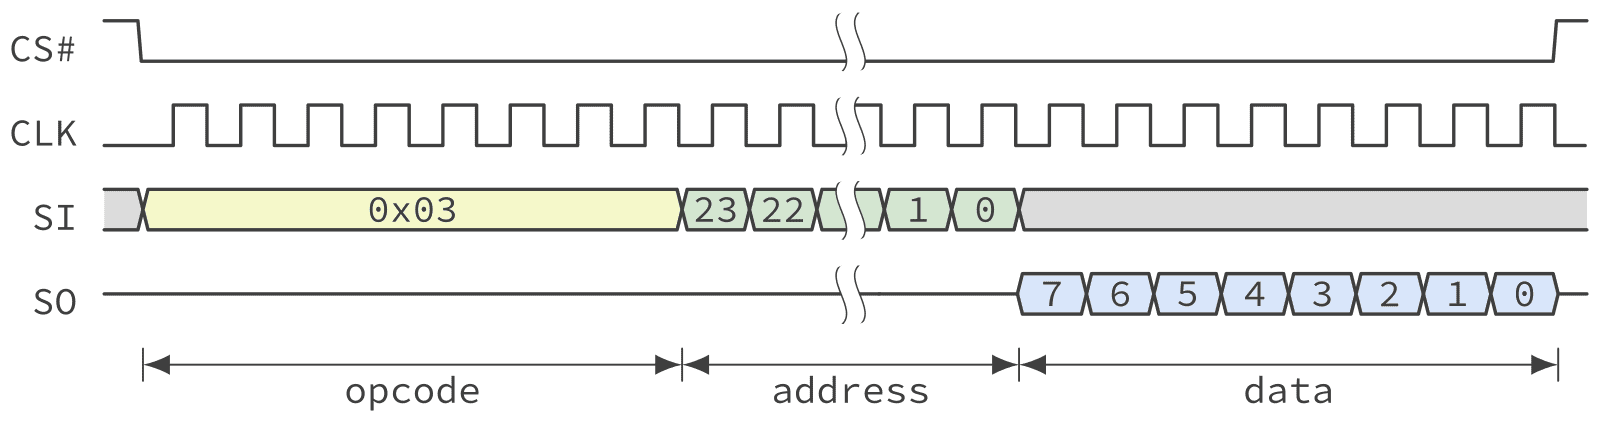 Timing diagram of a QSPI NOR Flash read operation in standard SPI mode.